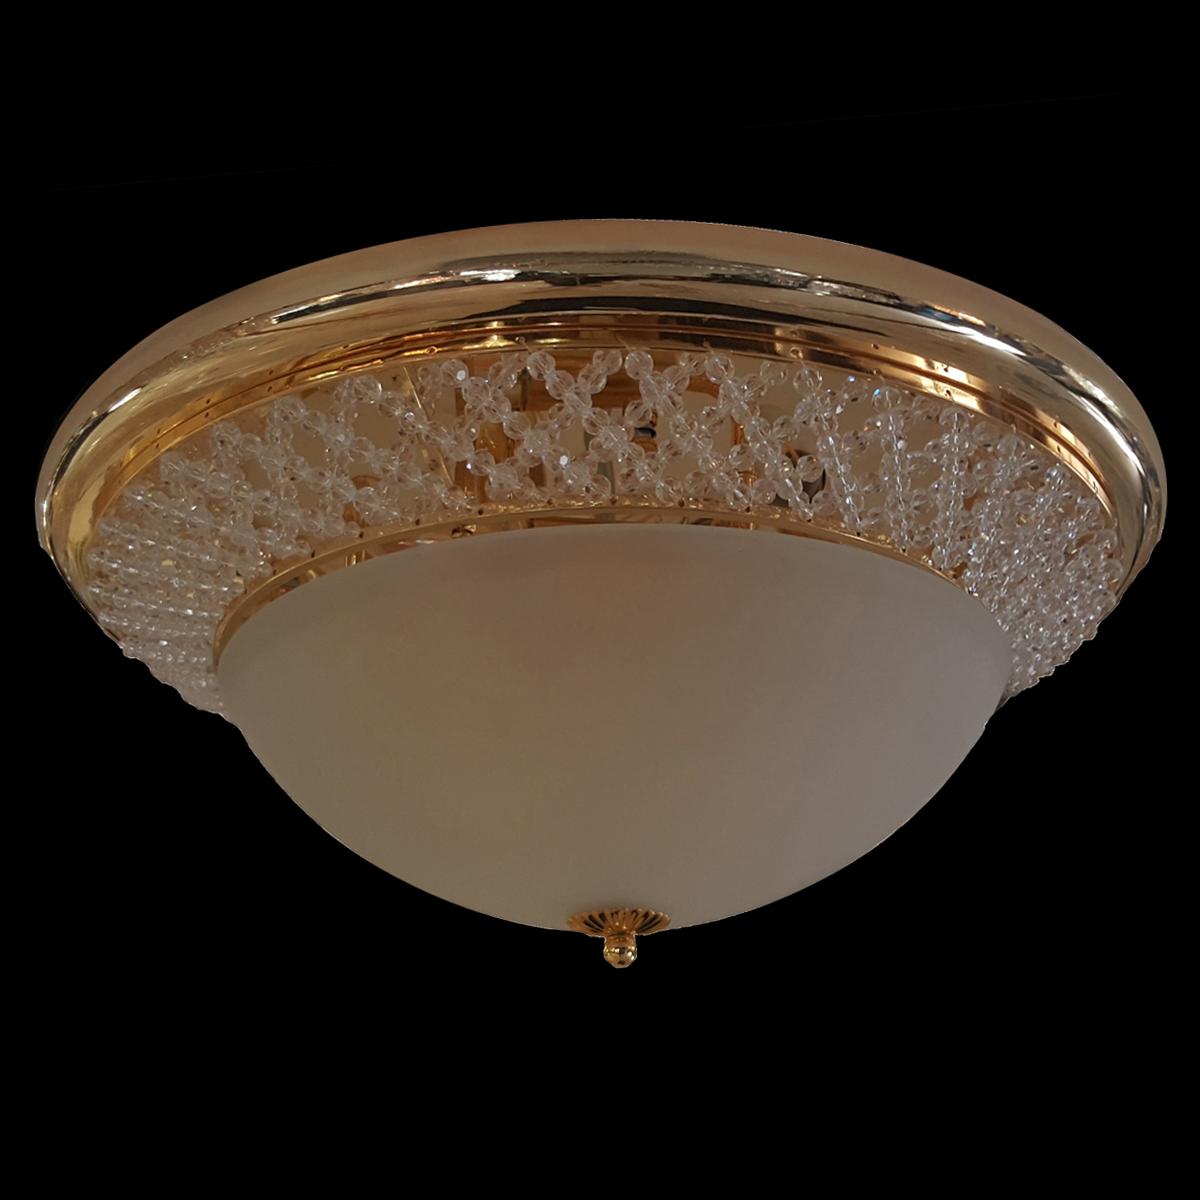 Dorset 380 Gold Ceiling Light - CTCDOR03380GD